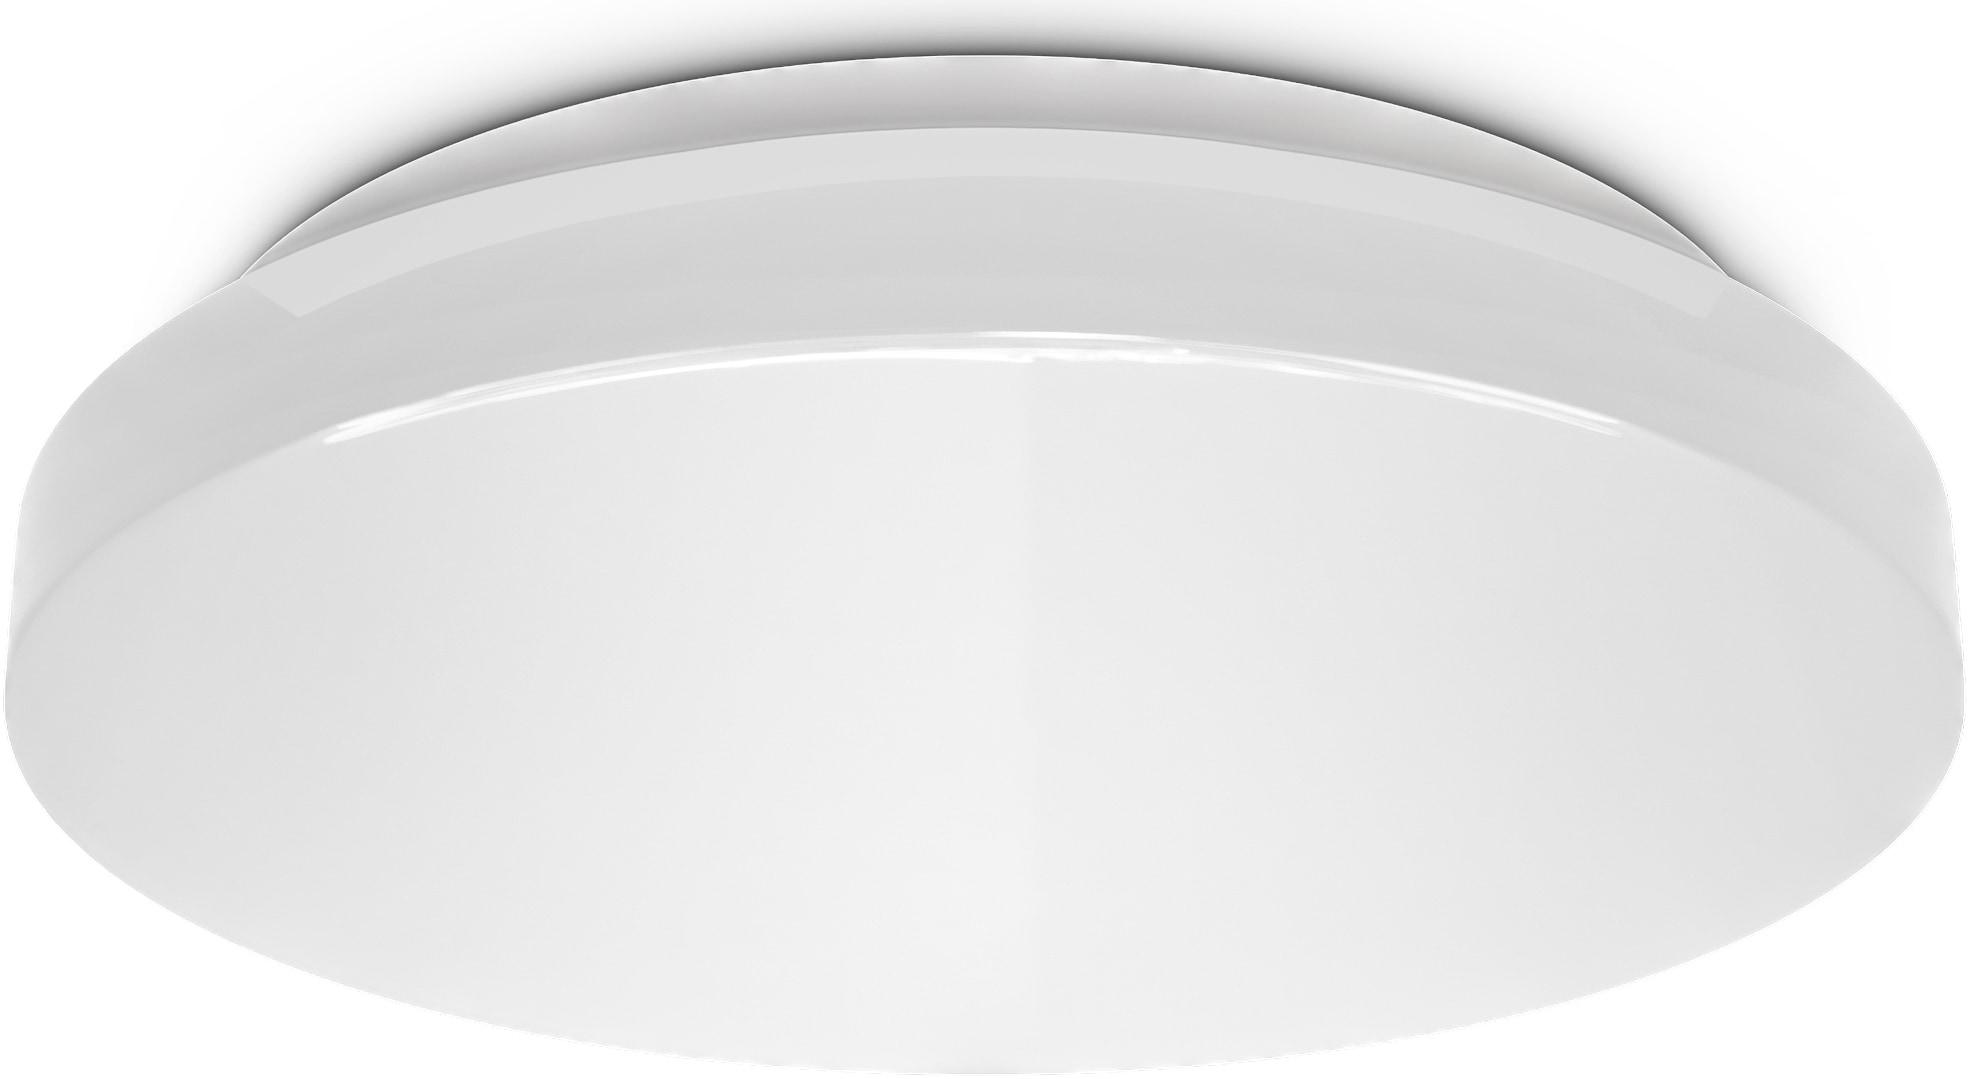 B.K.Licht LED Deckenleuchte, LED-Modul, Neutralweiß, LED Deckenlampe Bad inkl. 18 Watt LED Modul 1800lm 4000K flach IP44 weiß